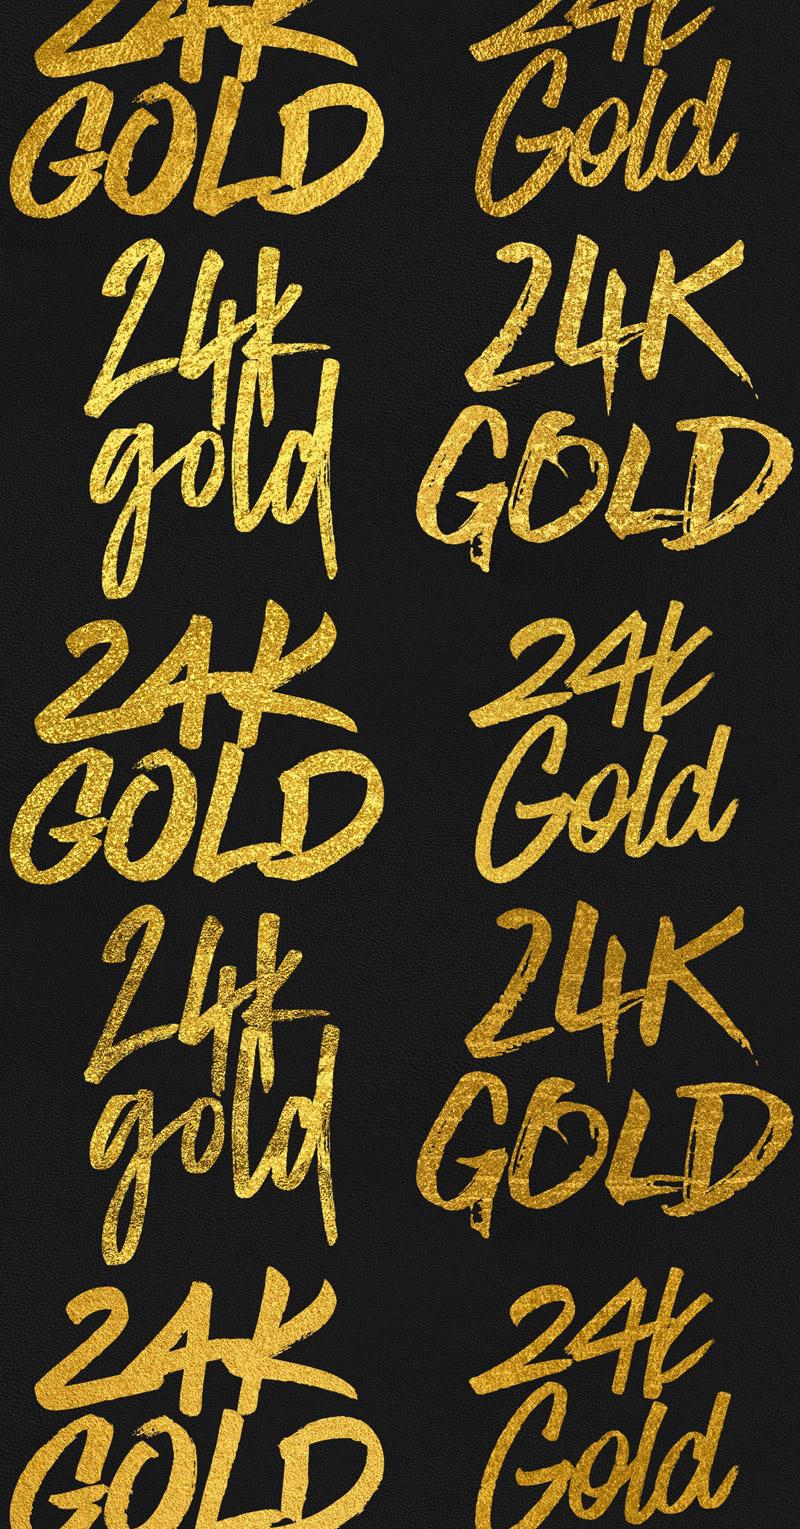 24k-gold-listing-photo-2-o_02